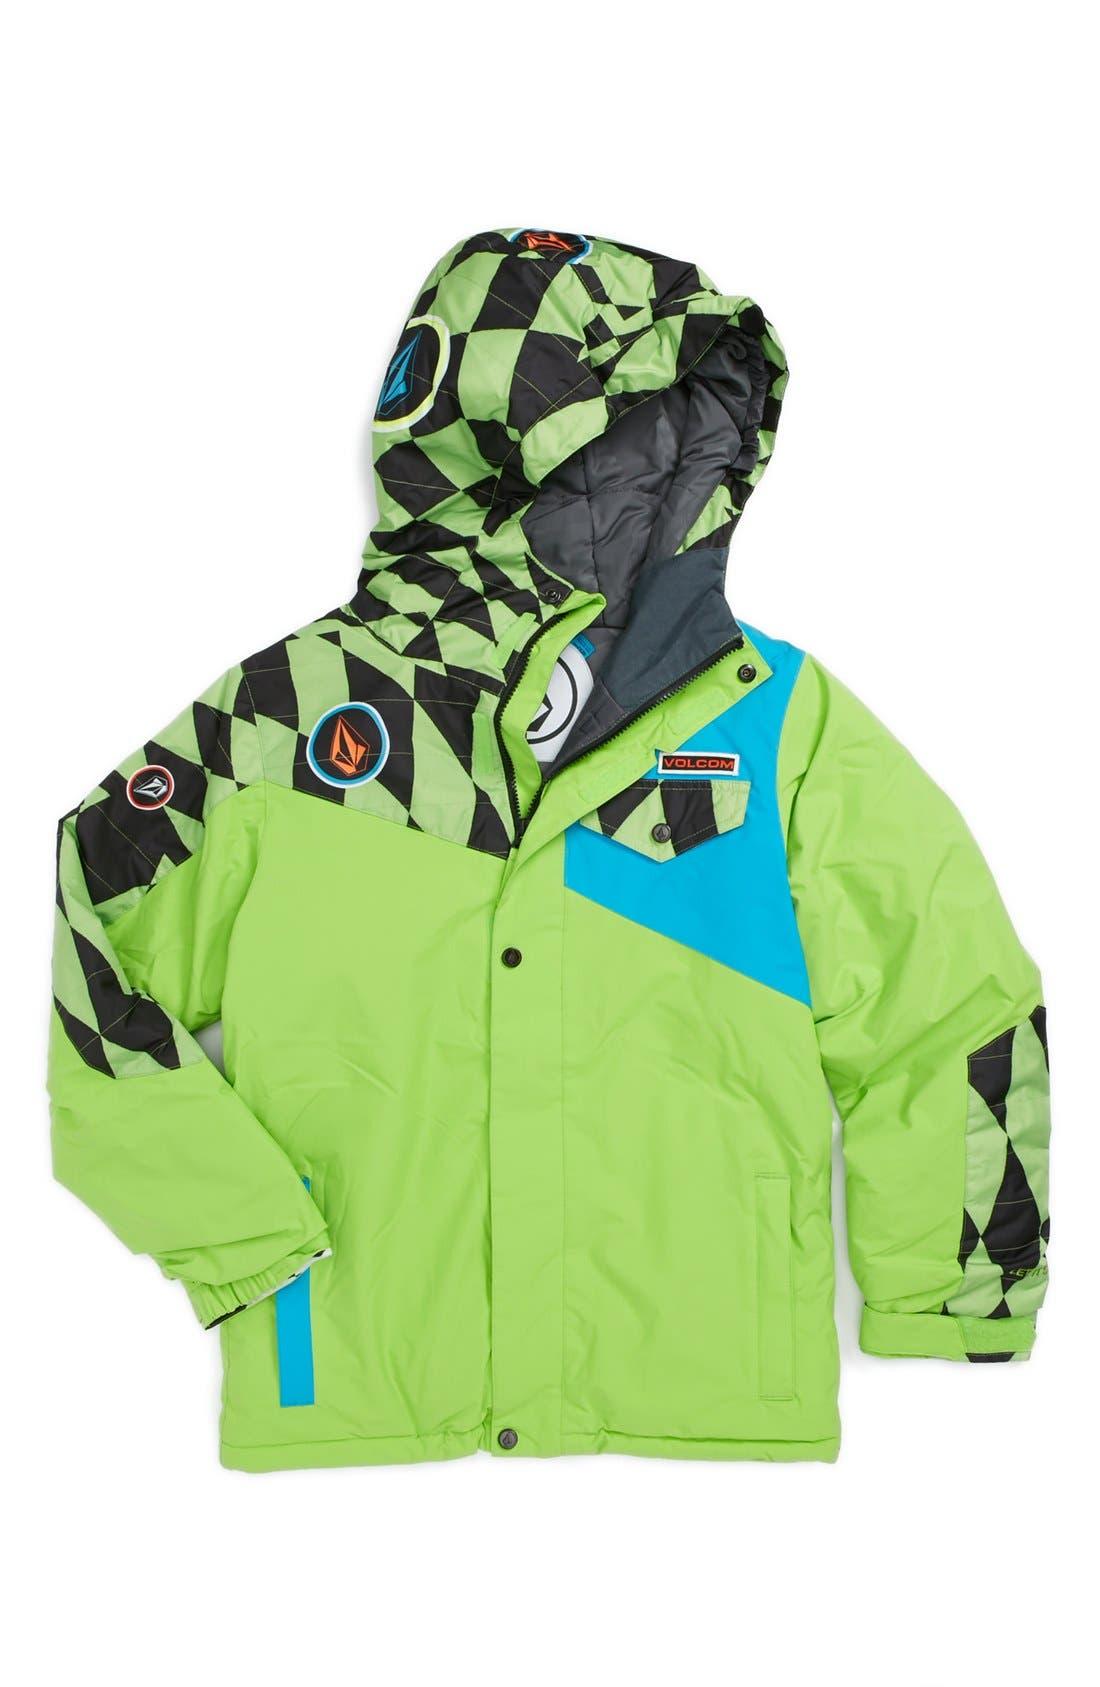 Alternate Image 1 Selected - Volcom 'Skiffle' Insulated Jacket (Little Boys & Big Boys)